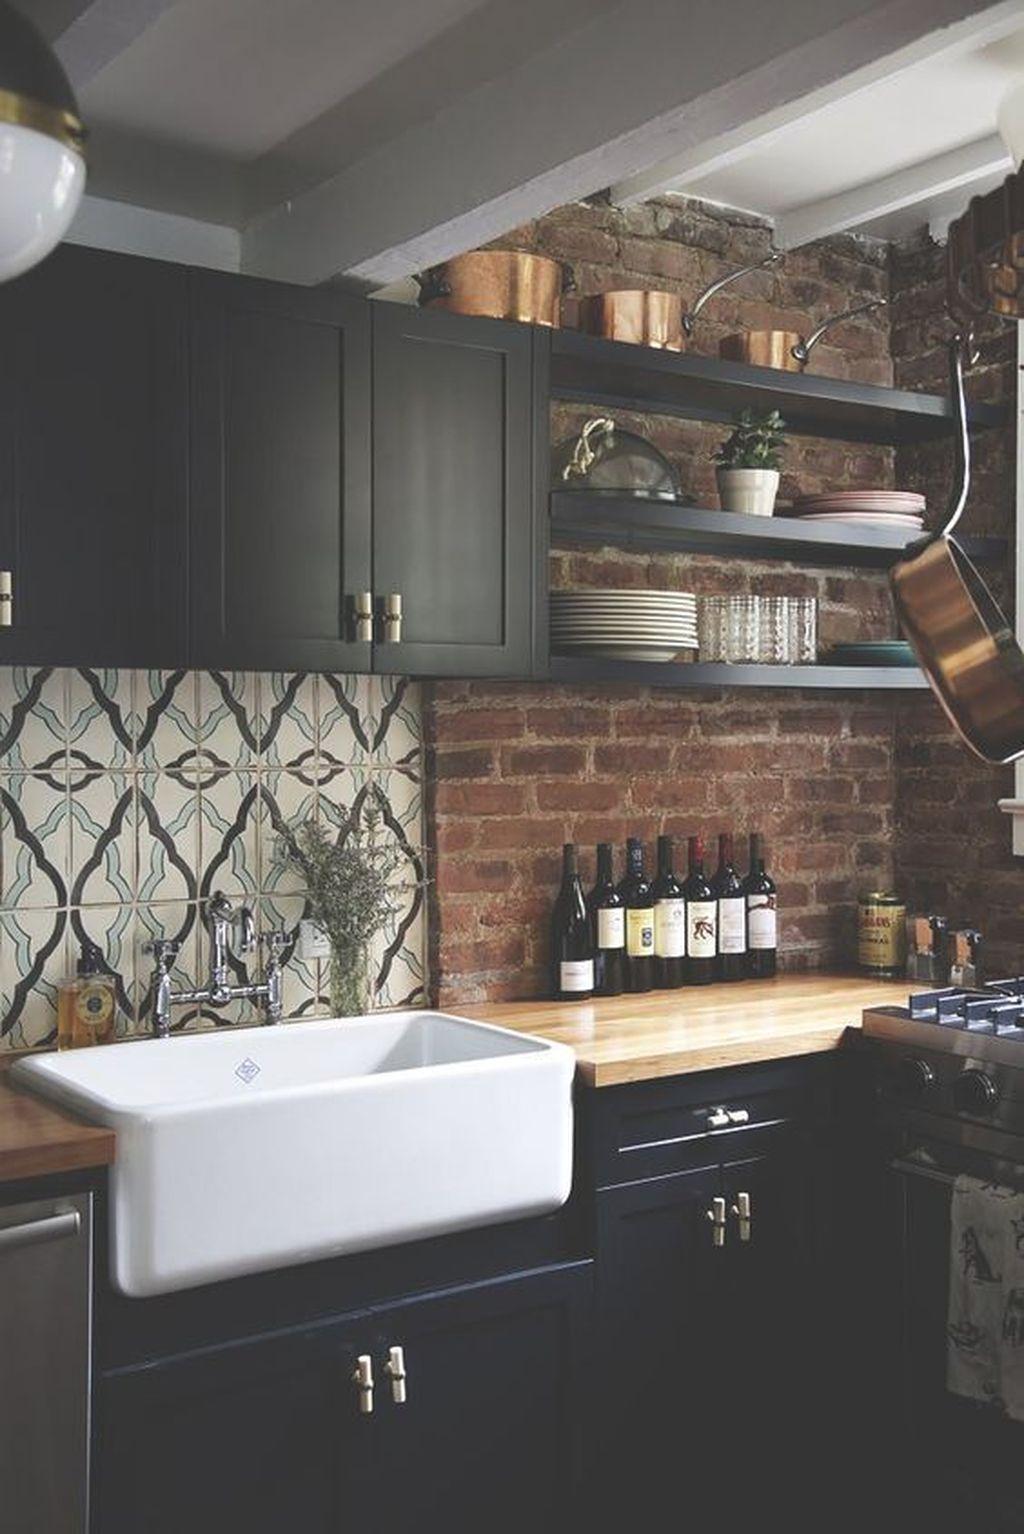 Popular Apartment Kitchen Design Ideas You Should Copy 31